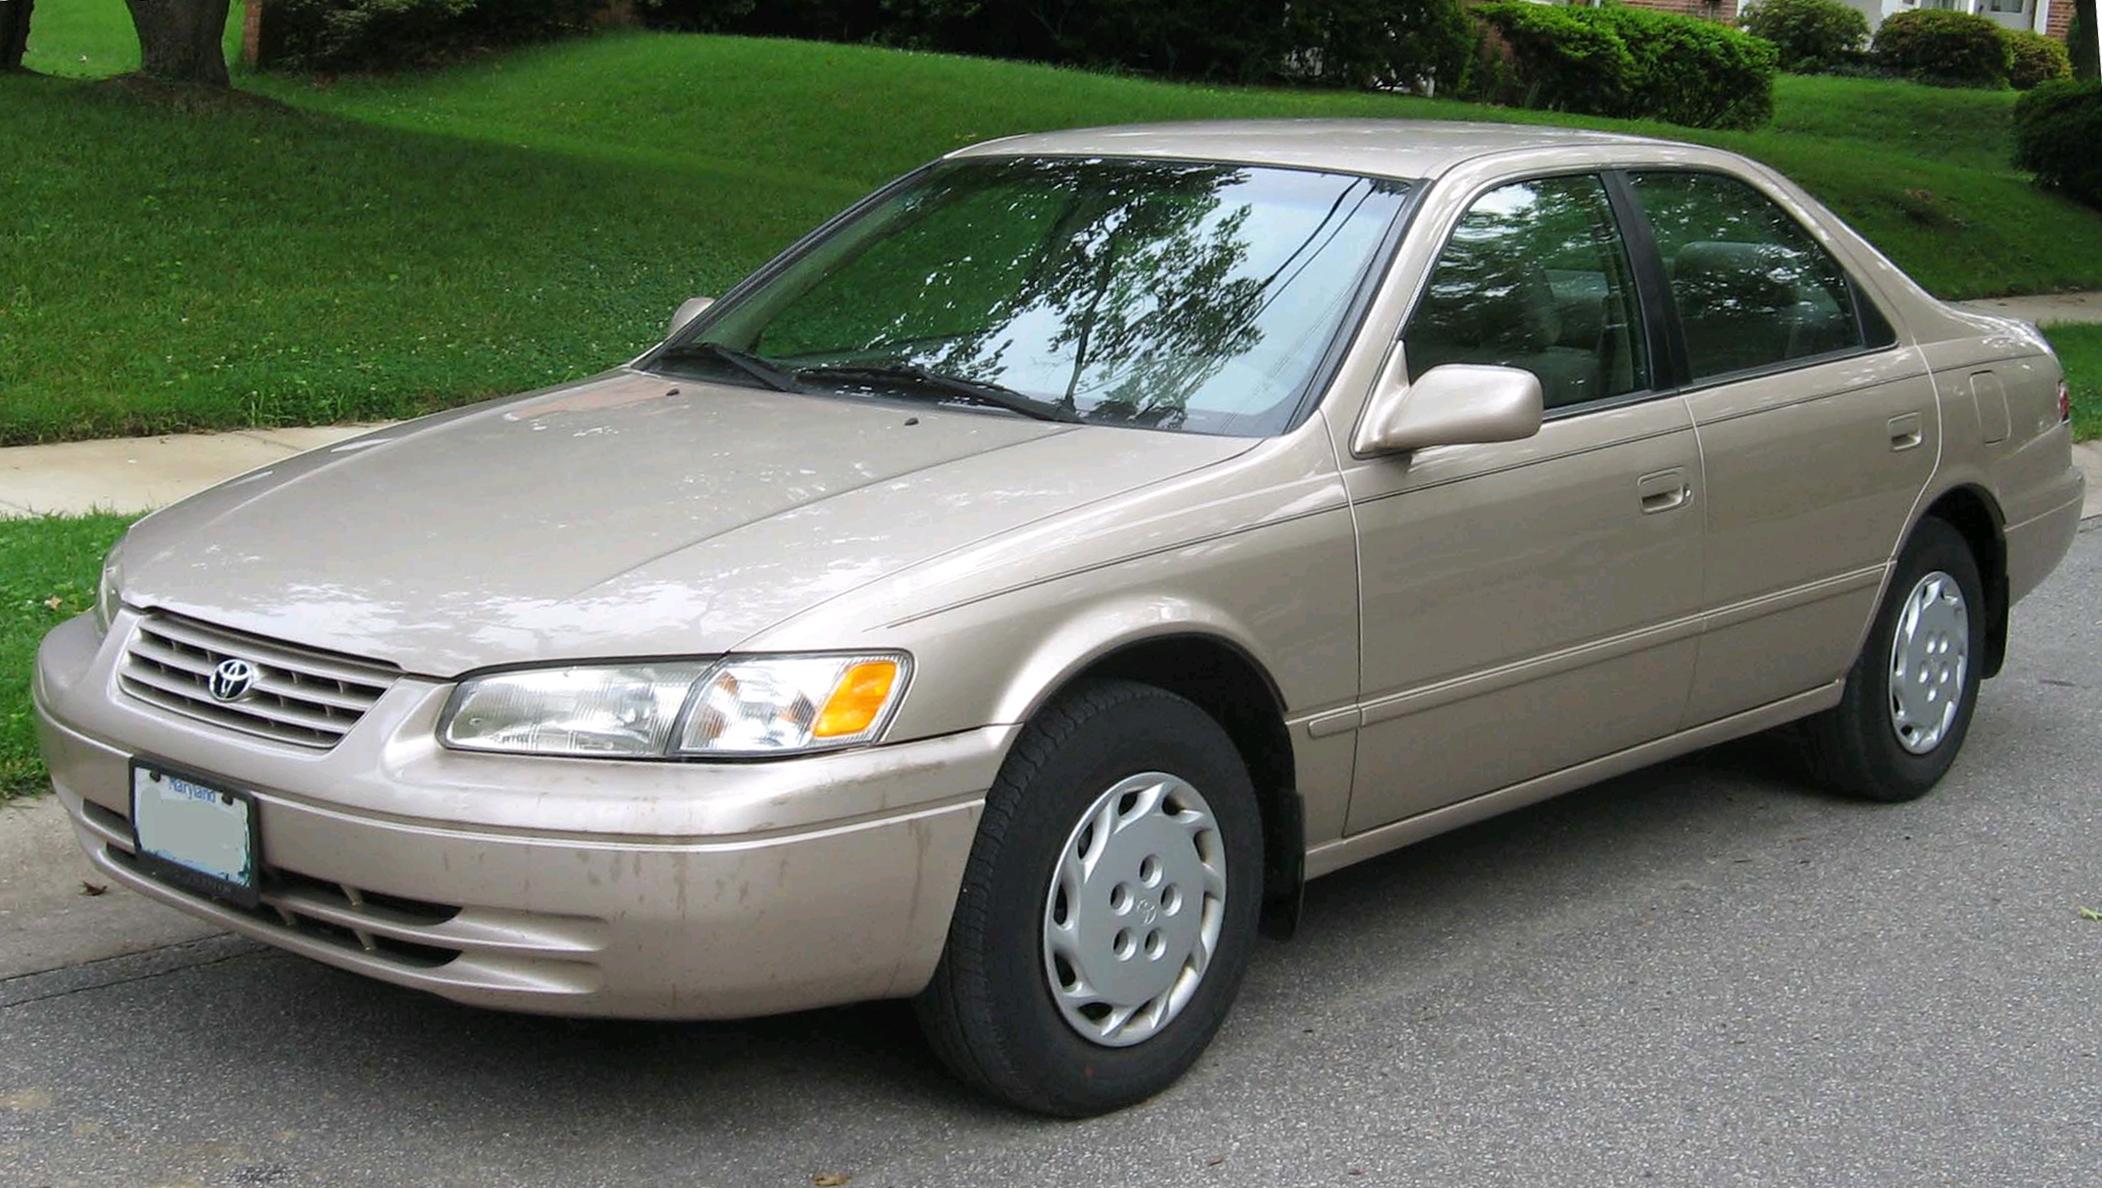 Used Cars West Bath Maine